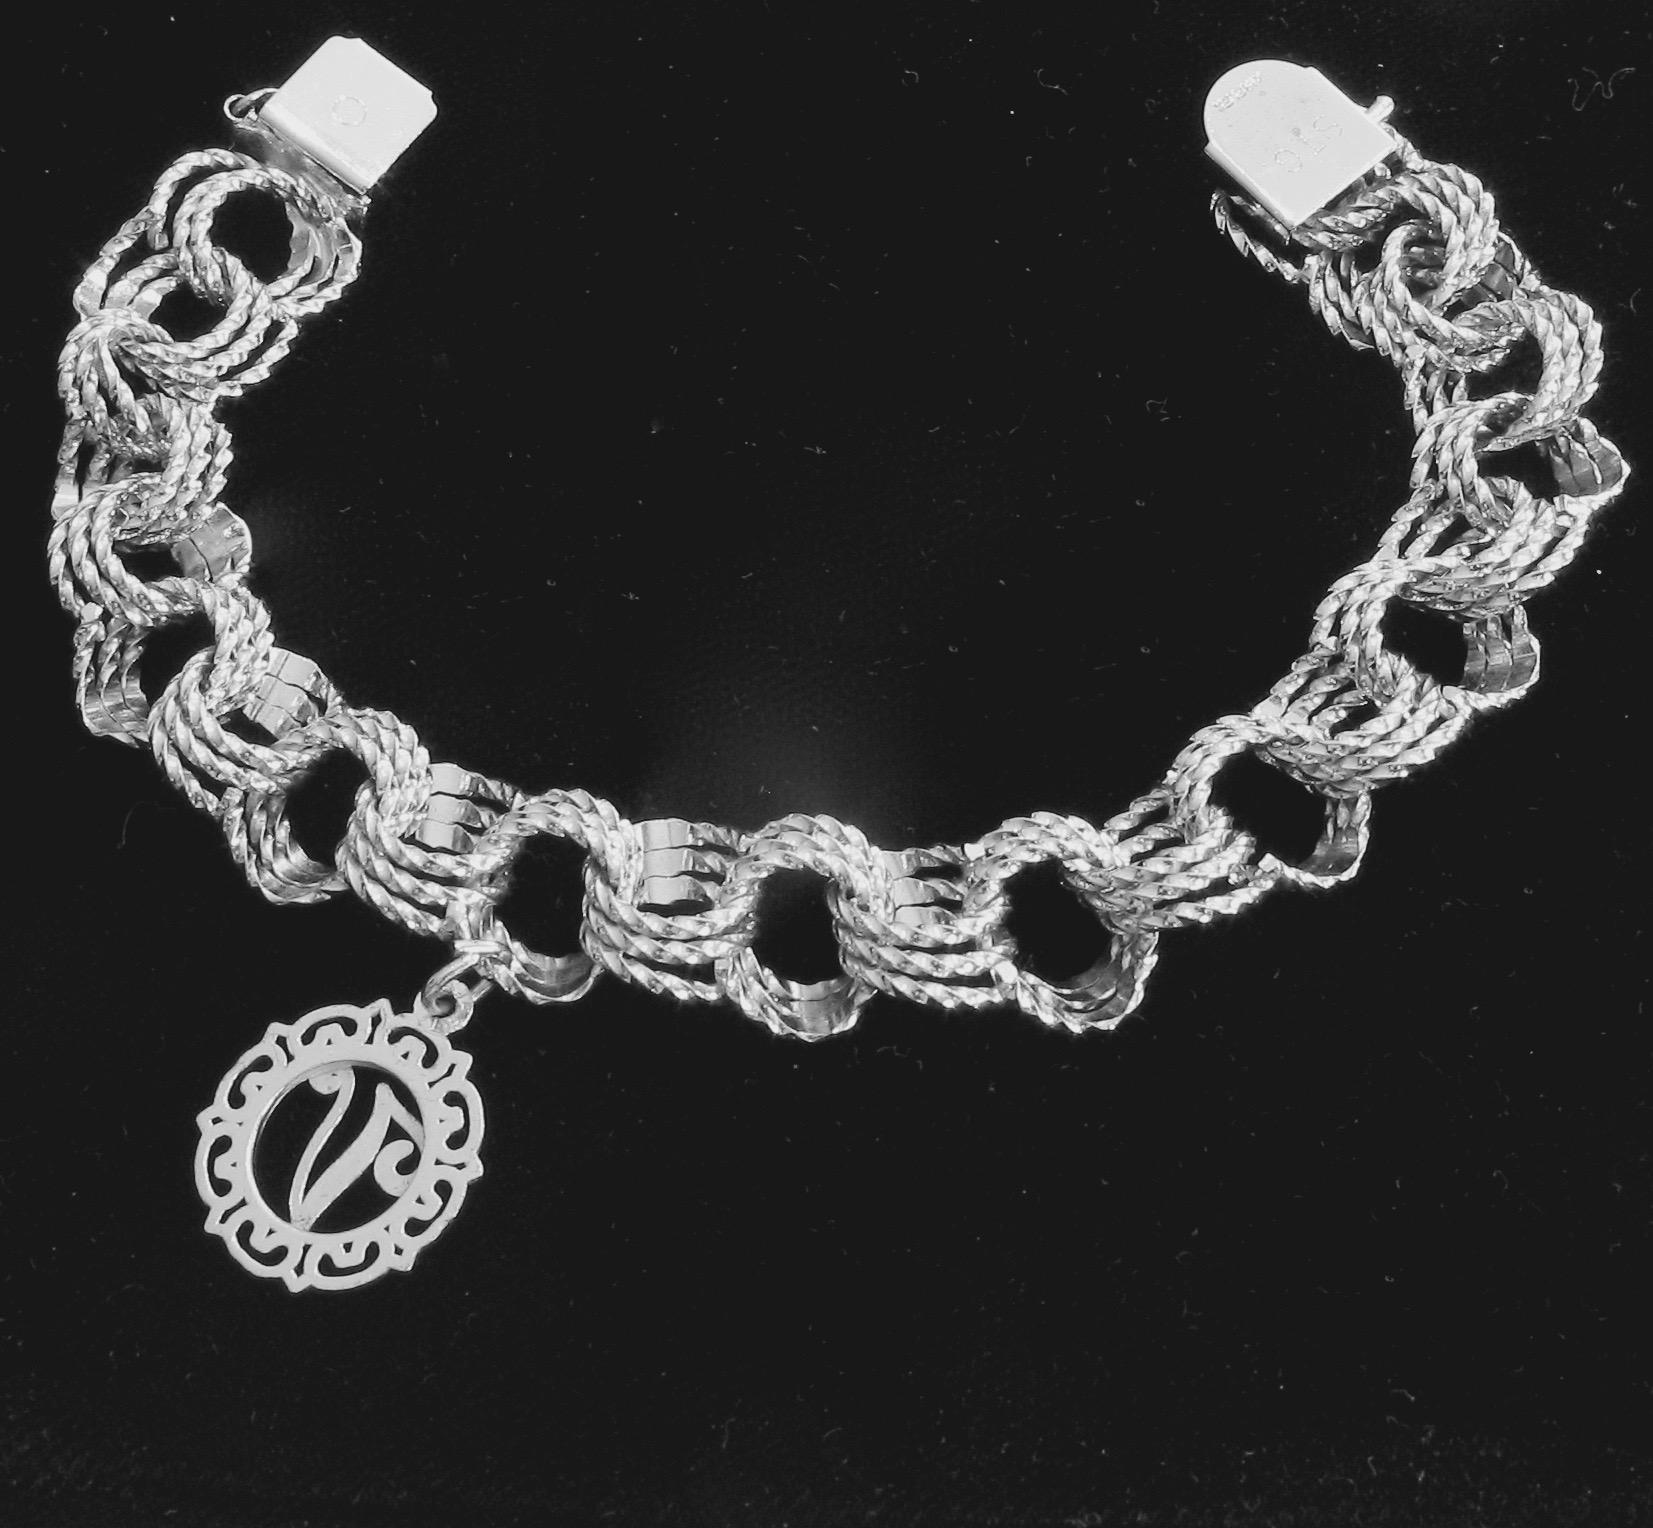 BCS SALE Vintage Sterling Silver Interlocking Loops Chain charm